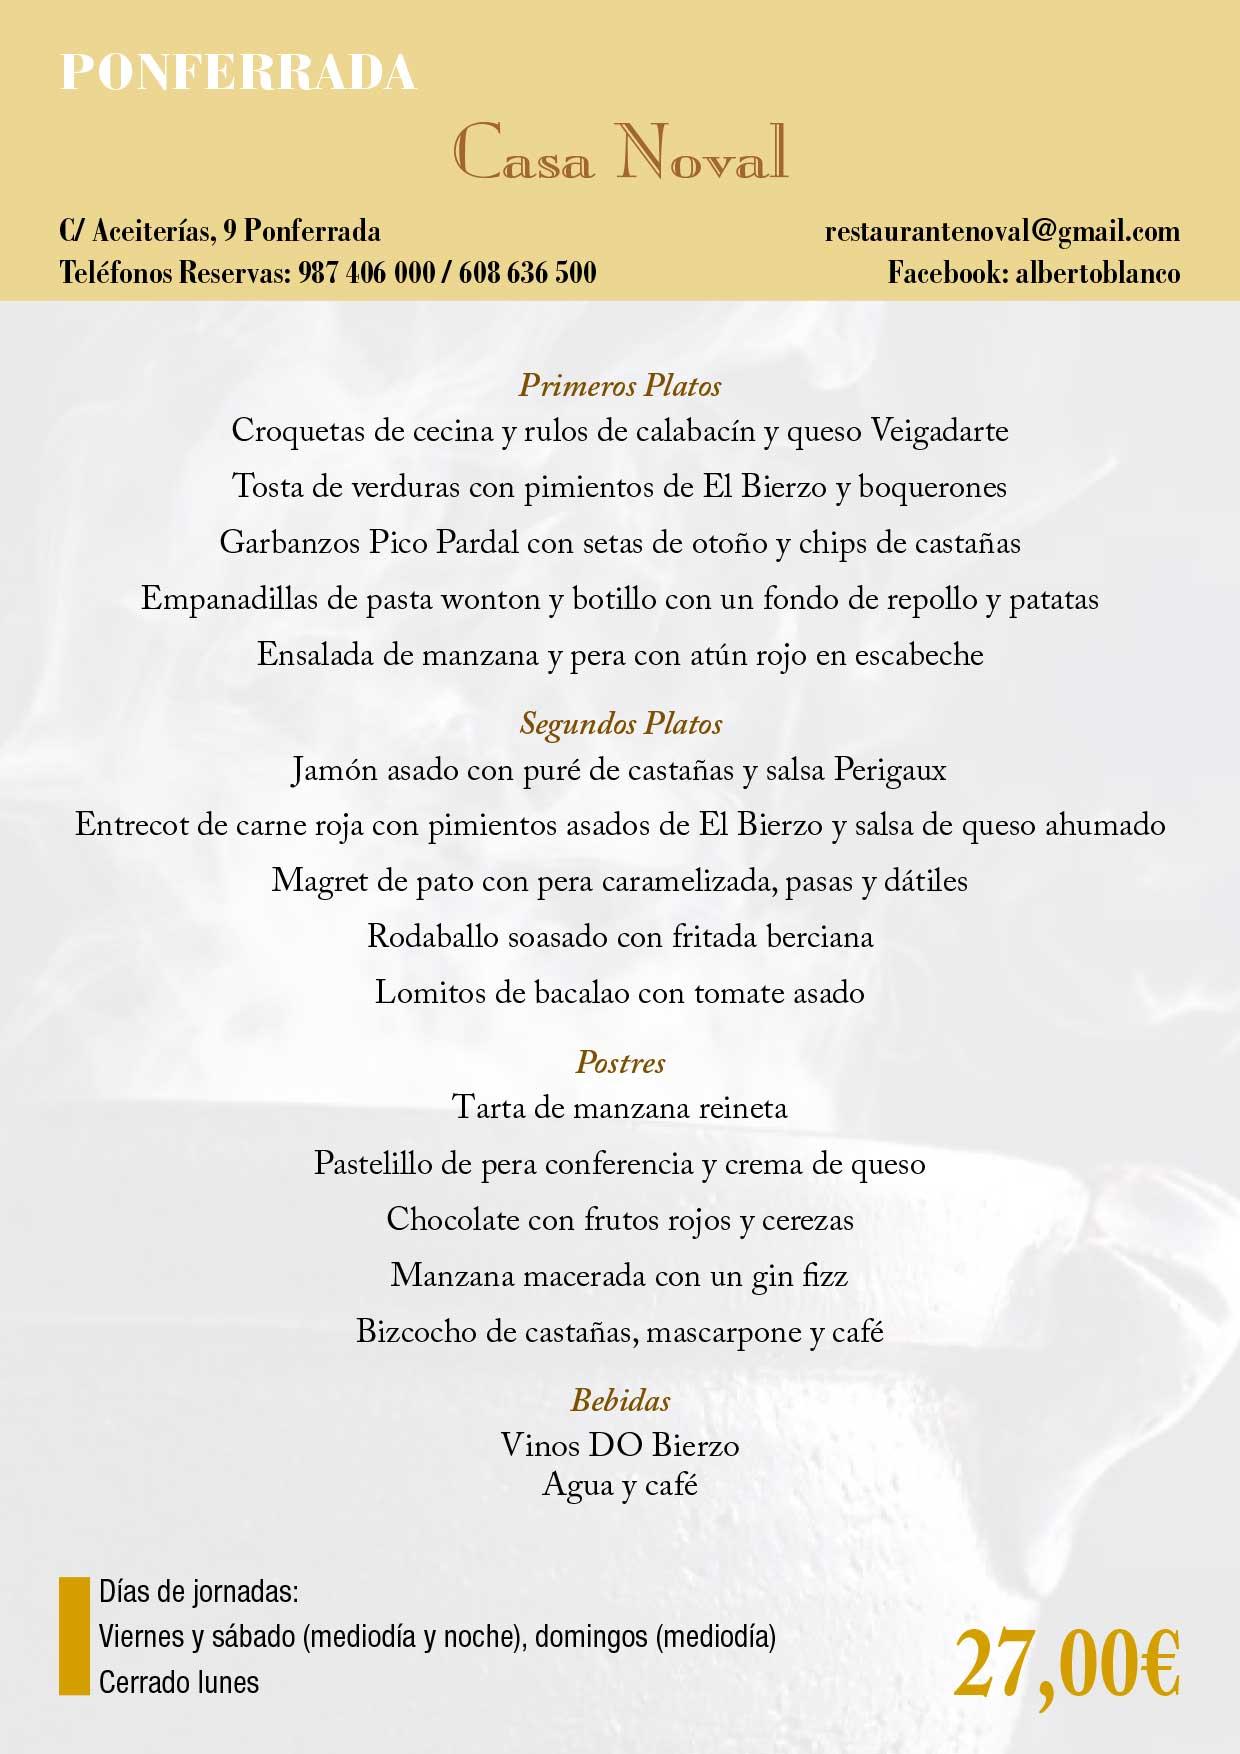 XXXIII Jornadas gastronómicas del Bierzo 2017. Restaurantes participantes 37